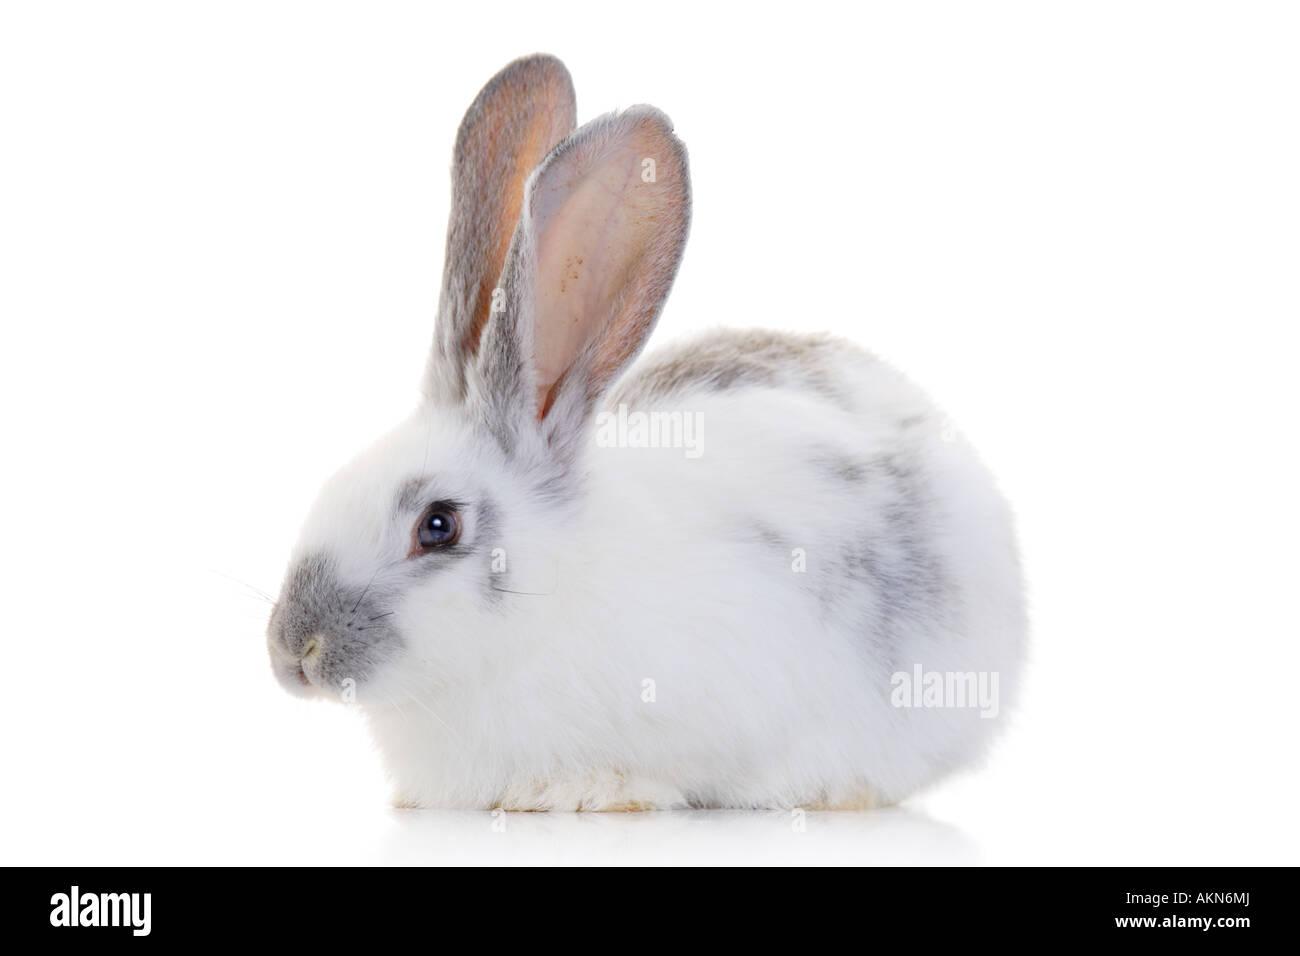 A rabbit - Stock Image